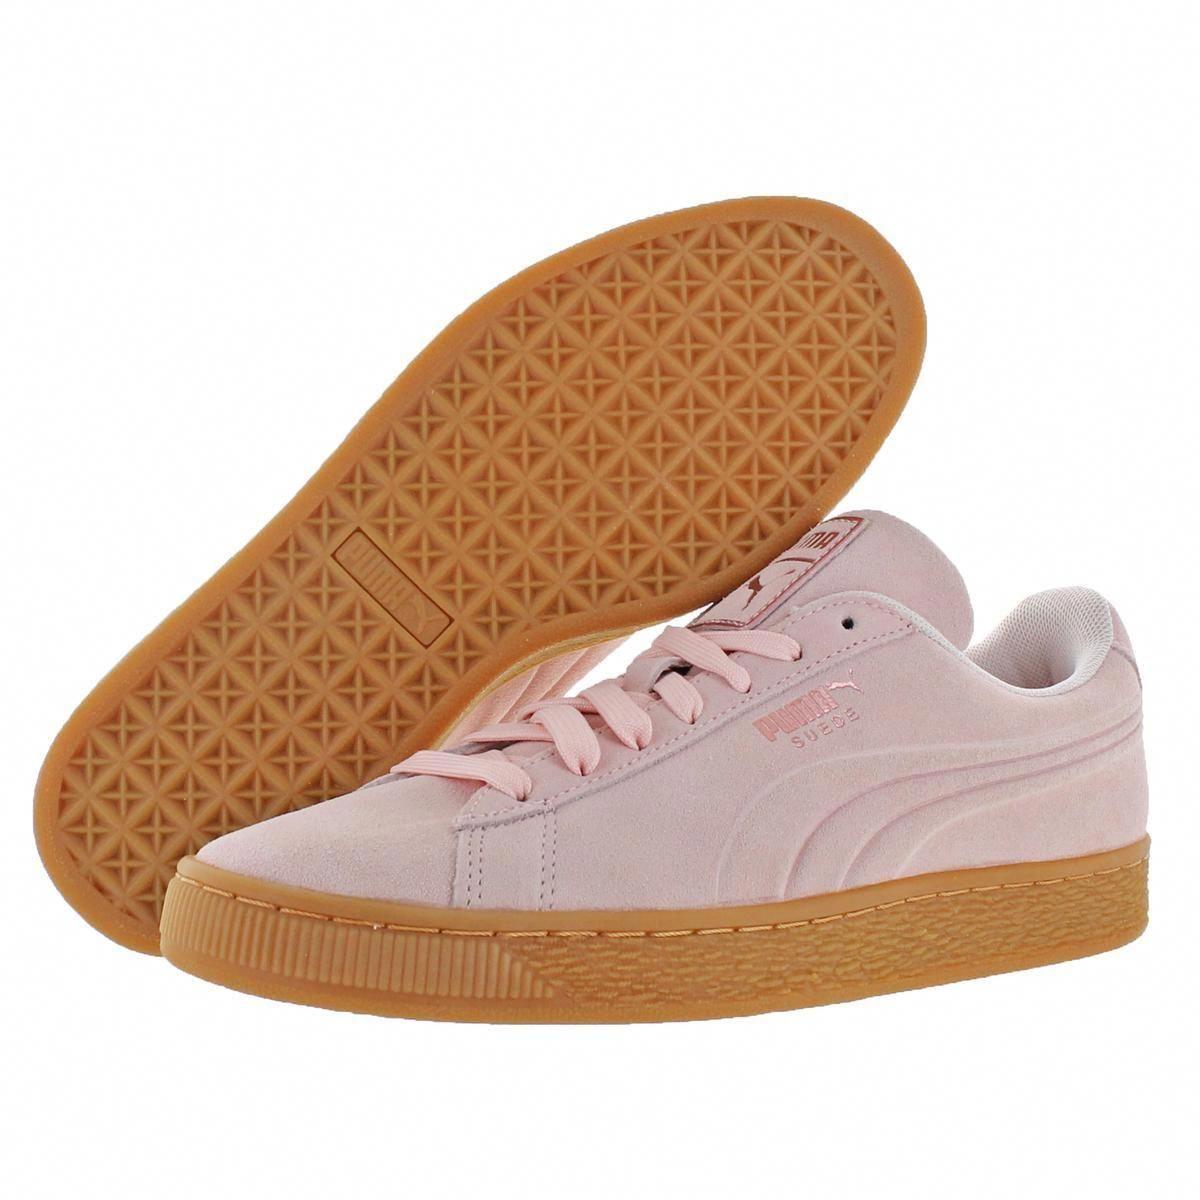 2fa9e0ac79cb Puma Suede Classic Men s Fashion Sneakers Shoes  MensFashionSneakers ...